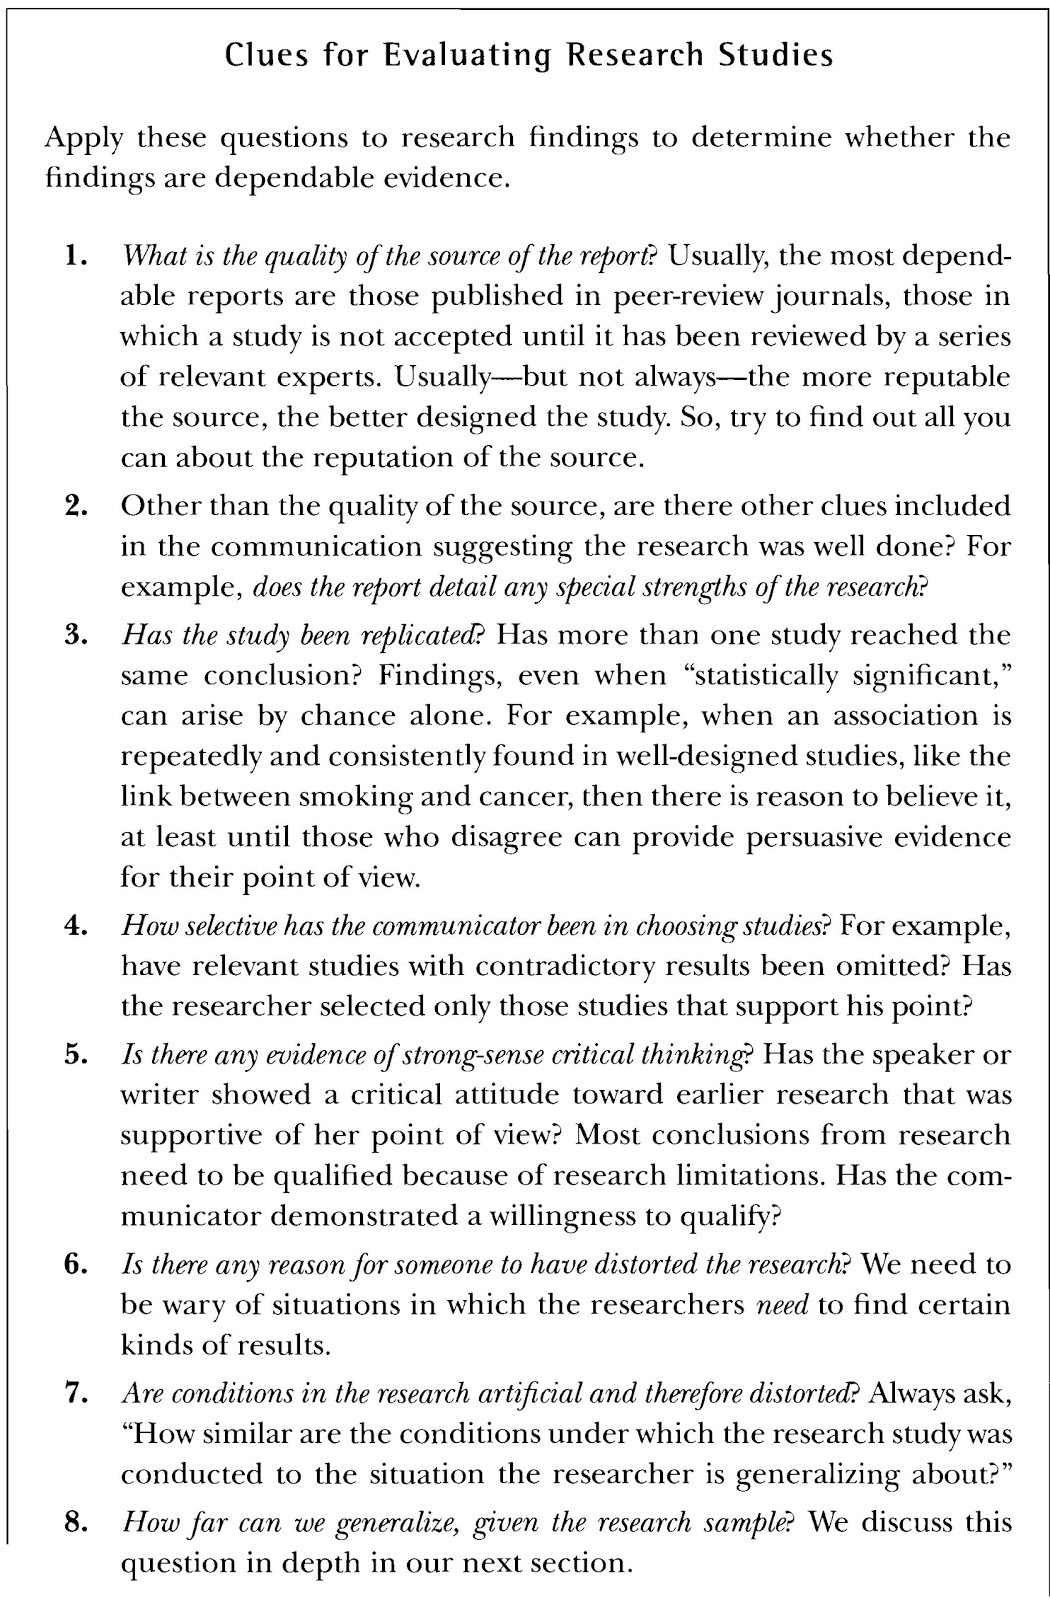 Customer Service Standards Essay